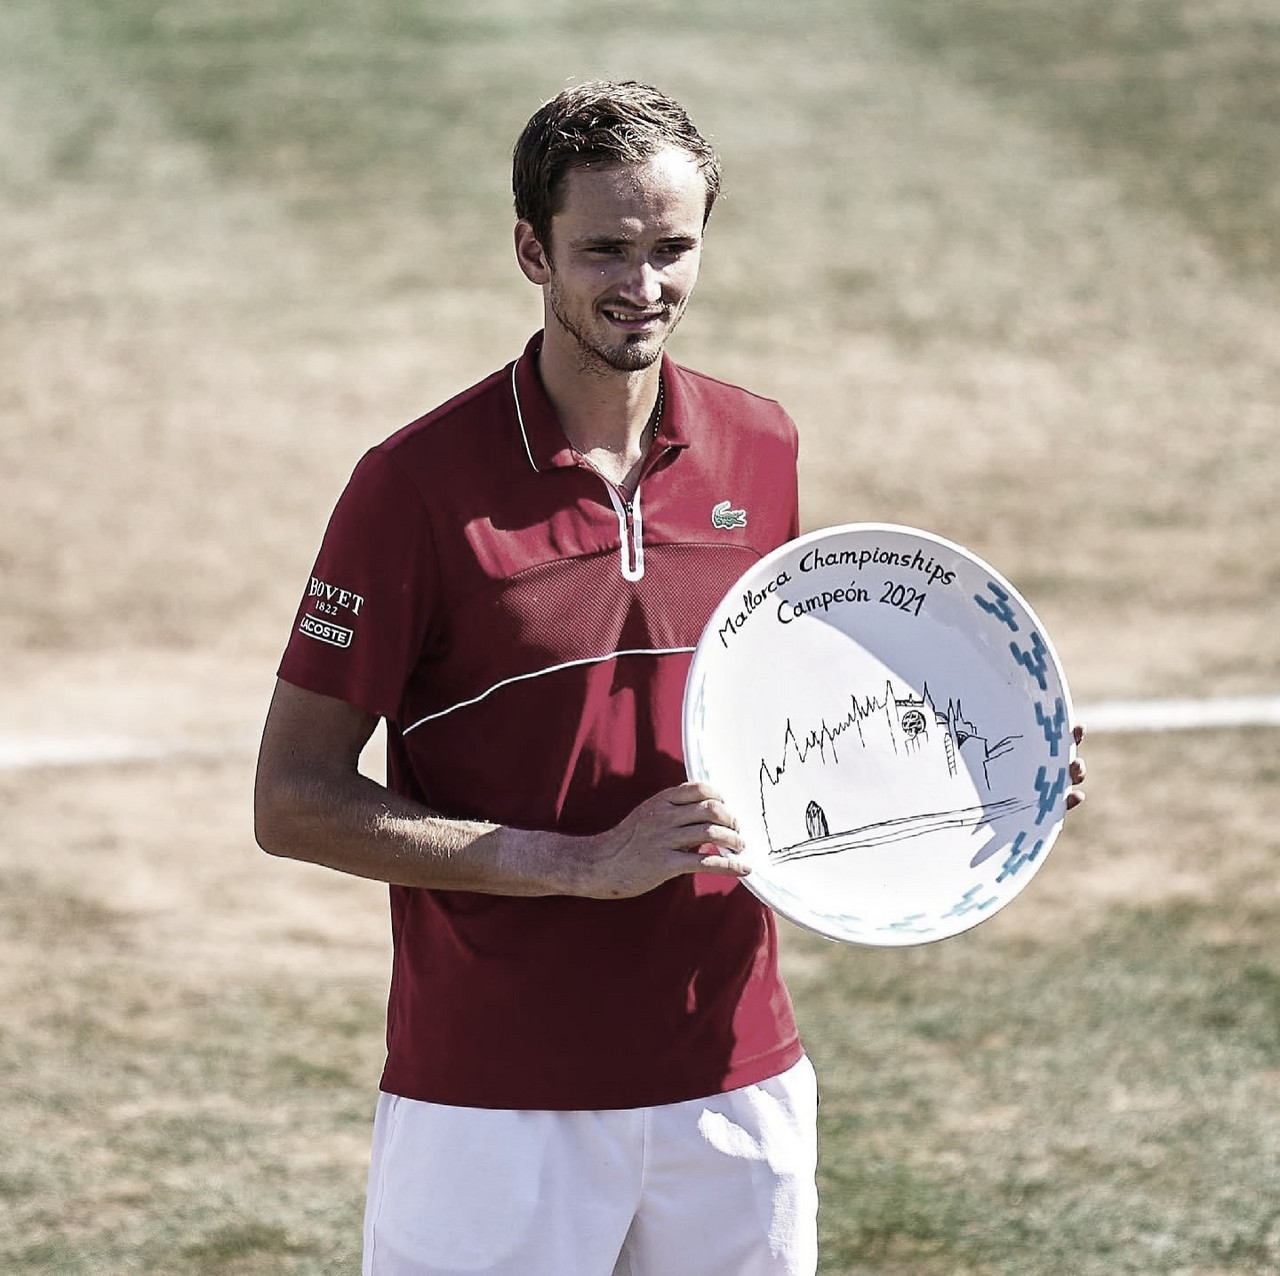 Medvedev reina en el Mallorca Championships